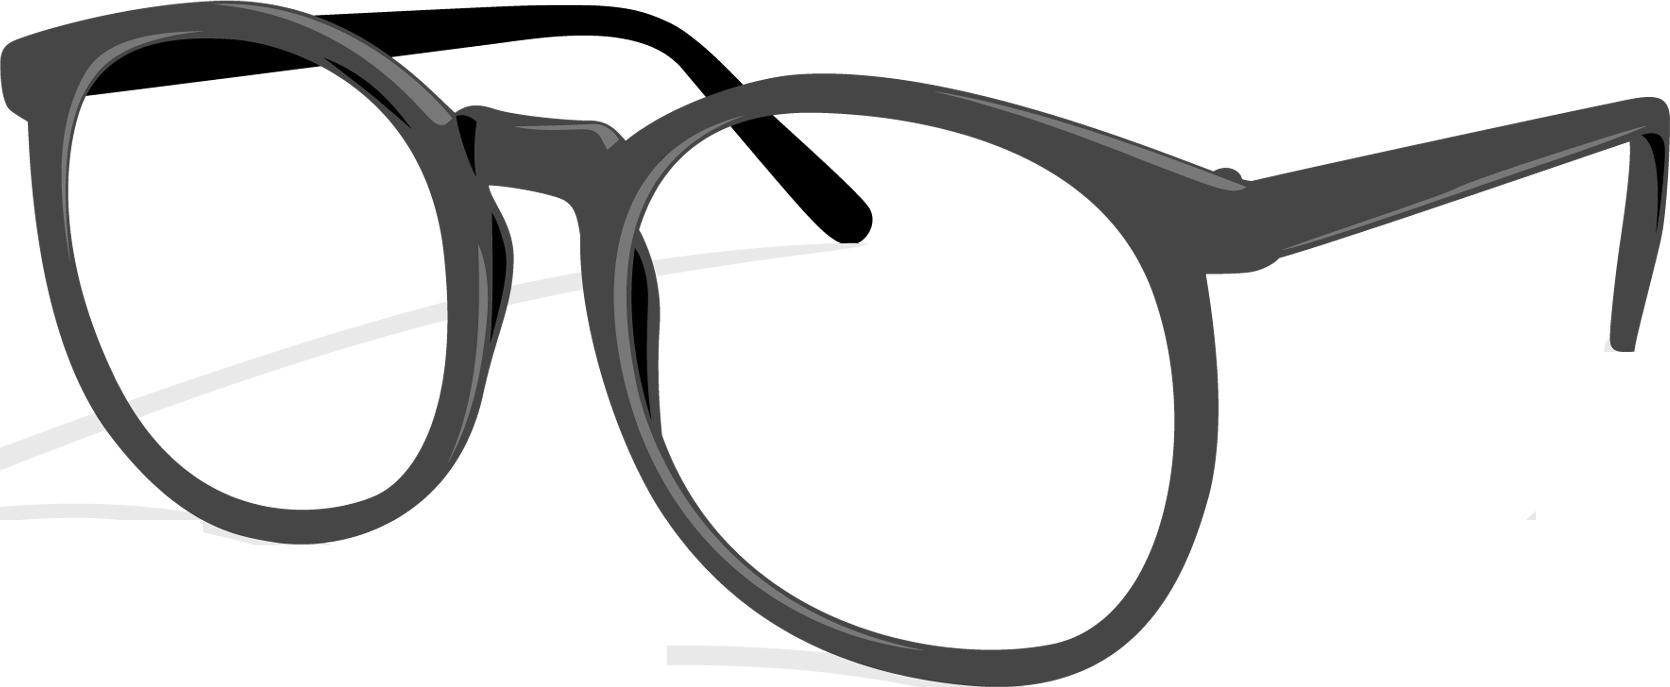 Glasses png image . Eyeglasses clipart close